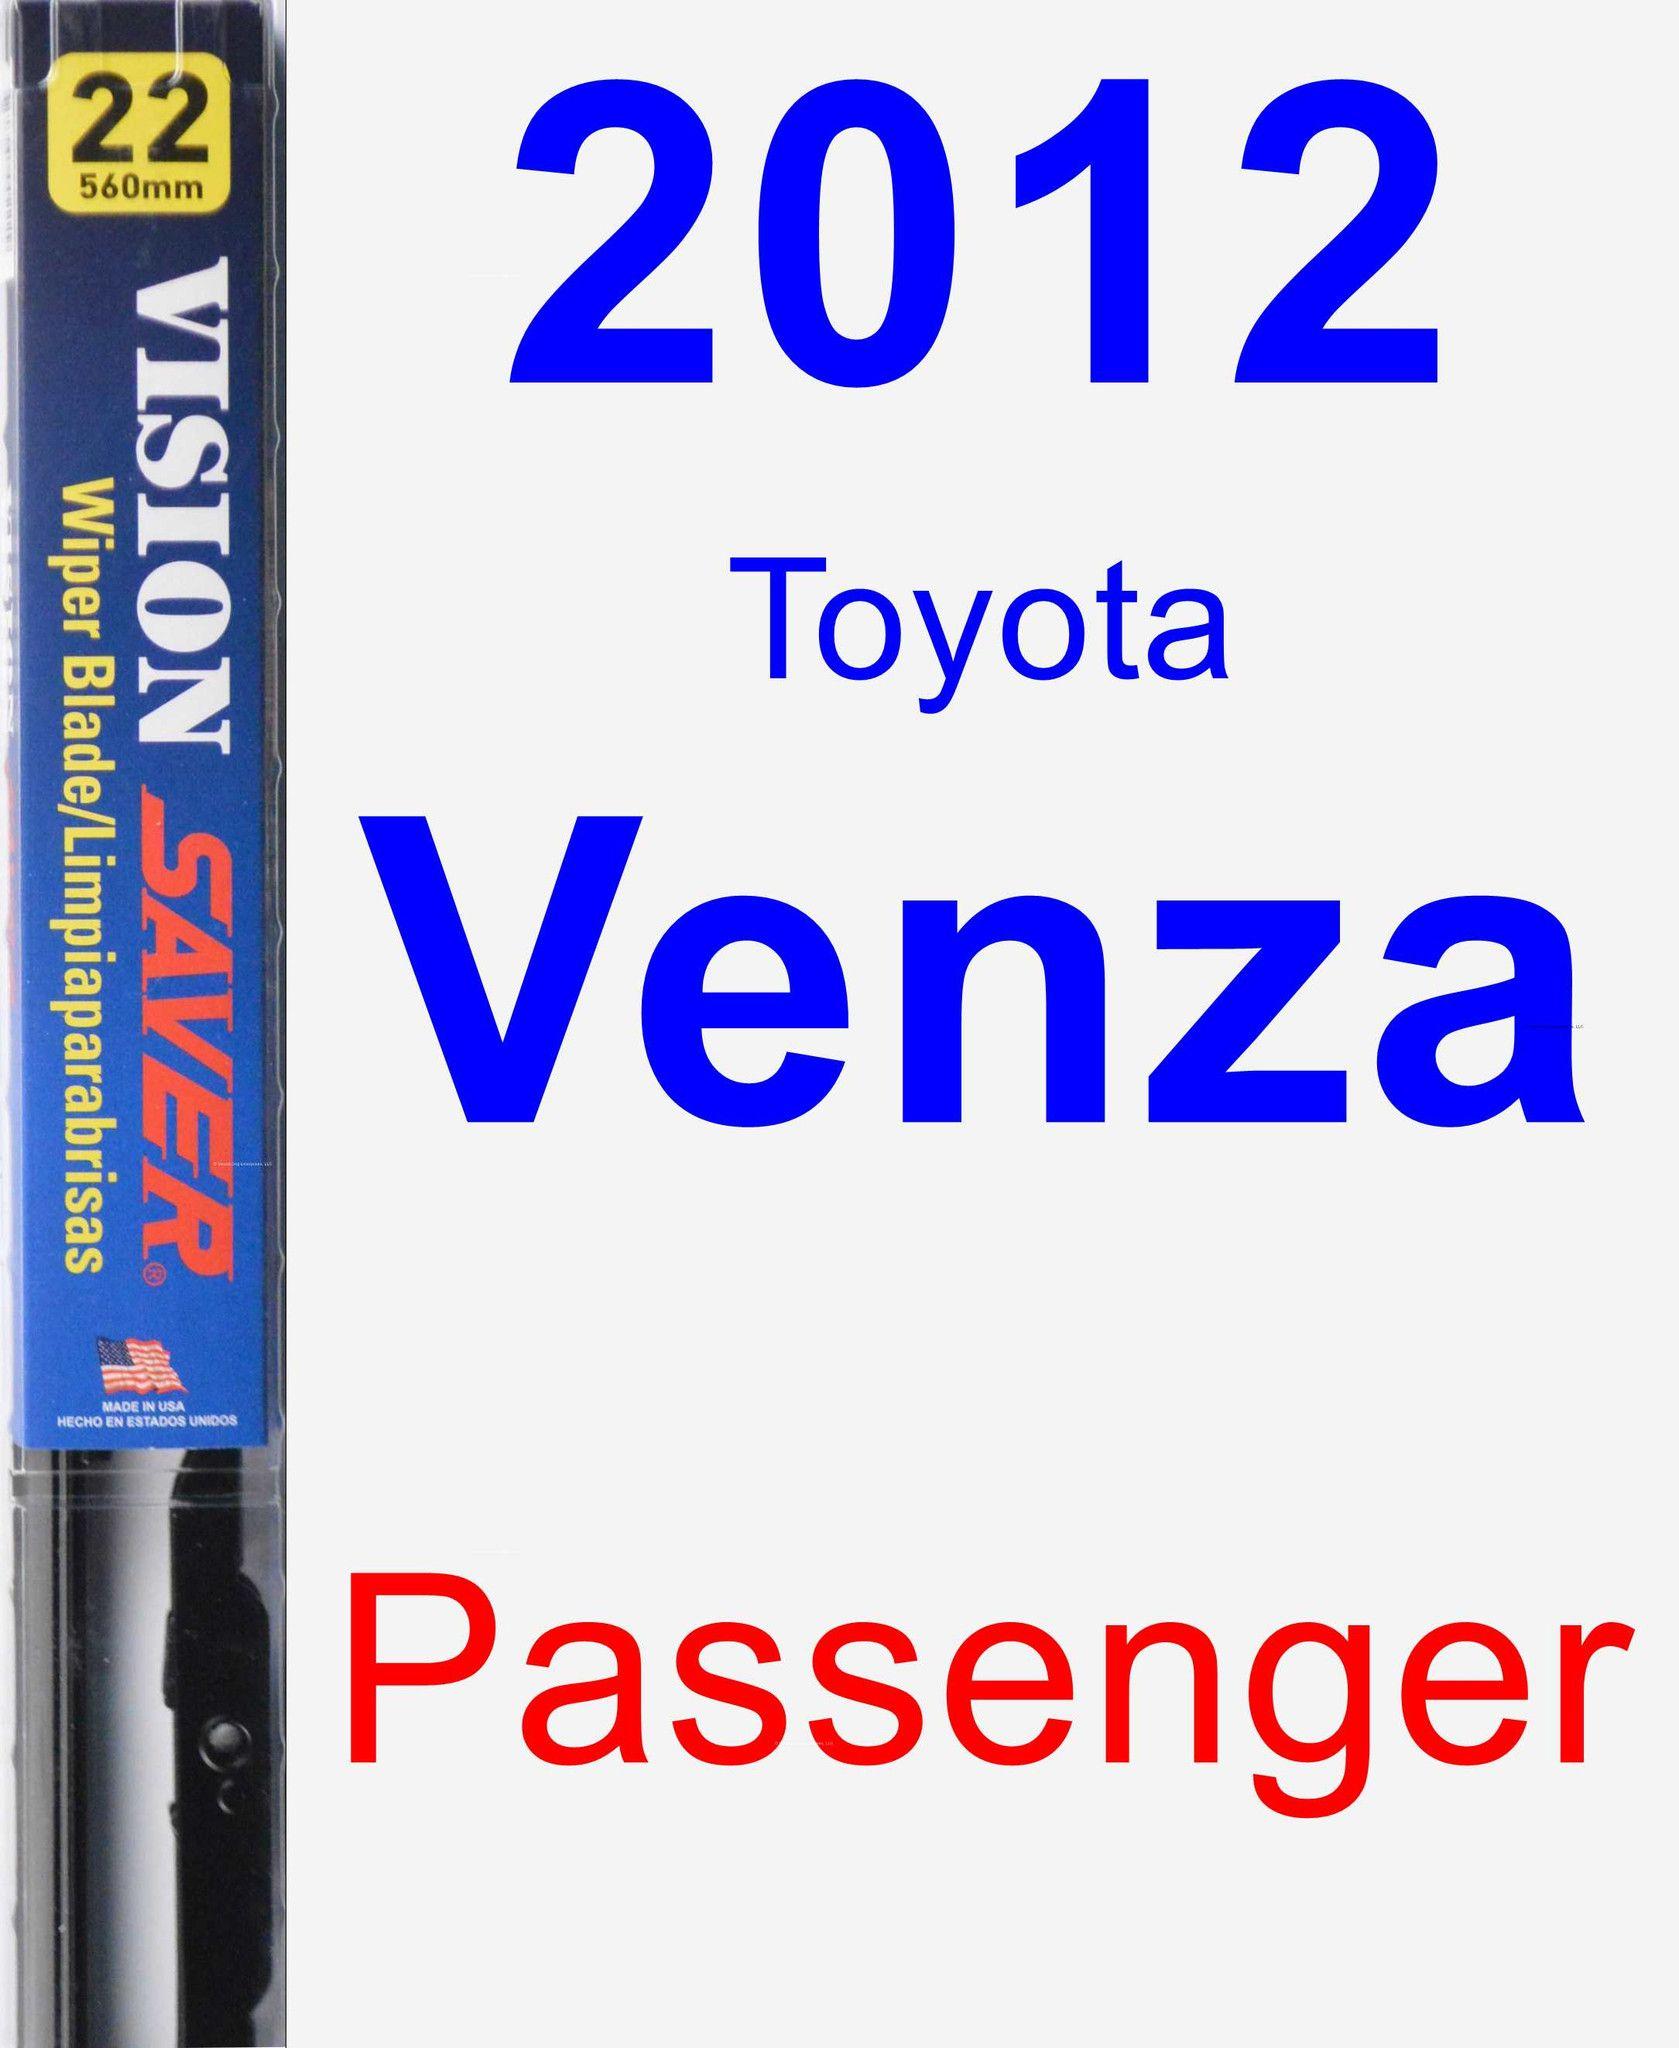 Passenger Wiper Blade for 2012 Toyota Venza - Vision Saver